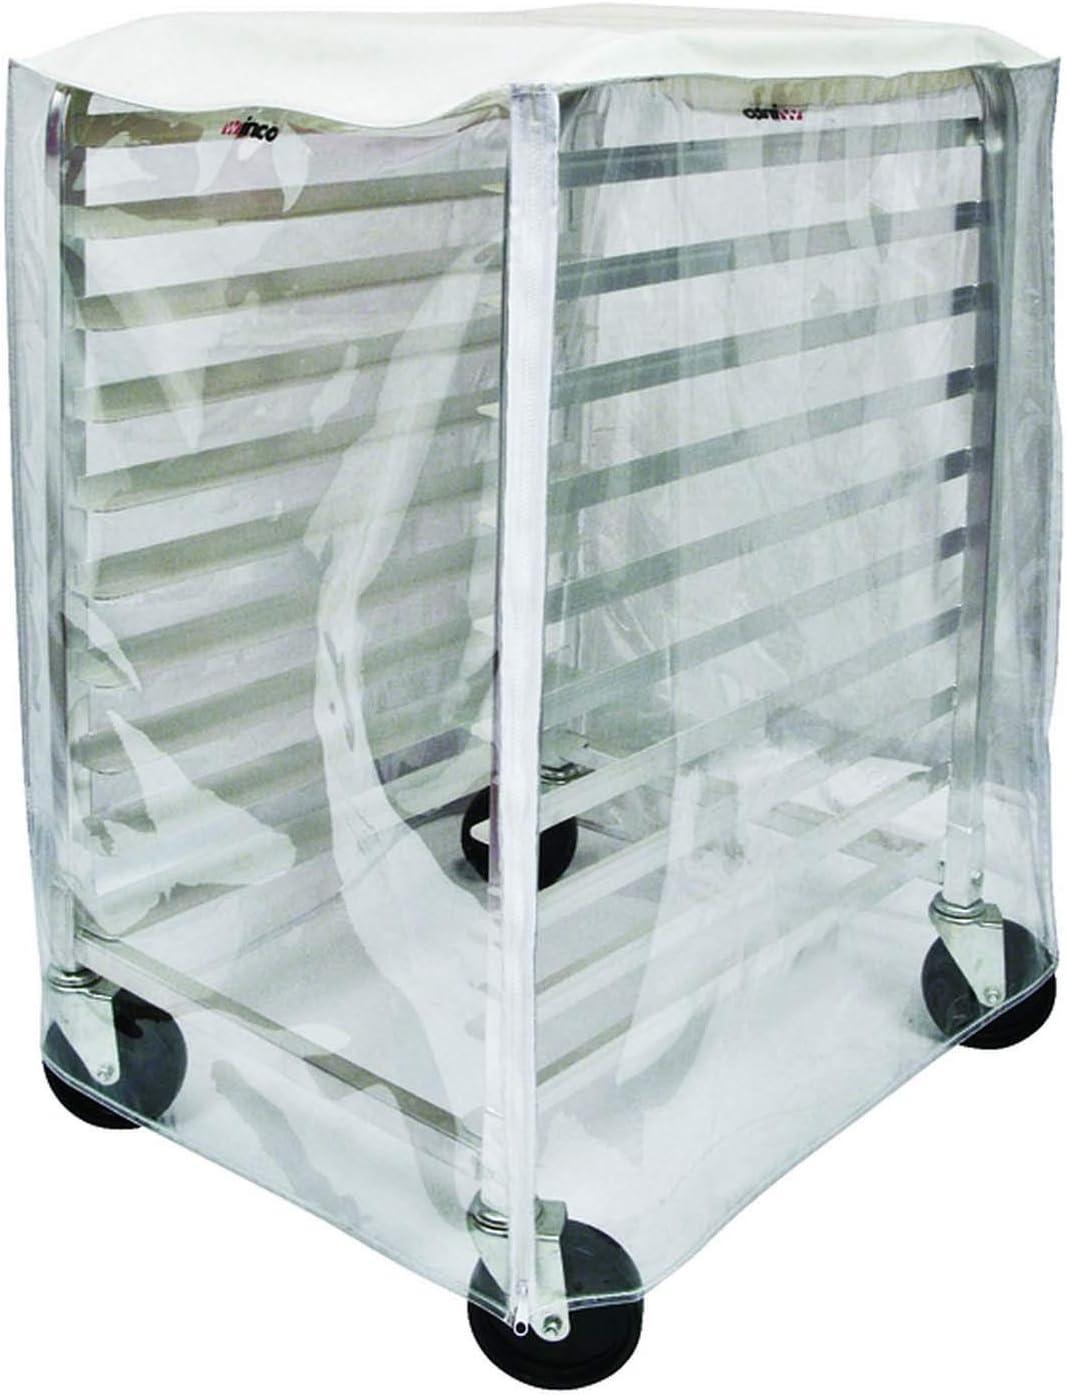 Winco ALRK-10-CV Cover for 10-Tier Sheet Pan Rack ALRK-10 and ALRK-10BK,Clear,Medium